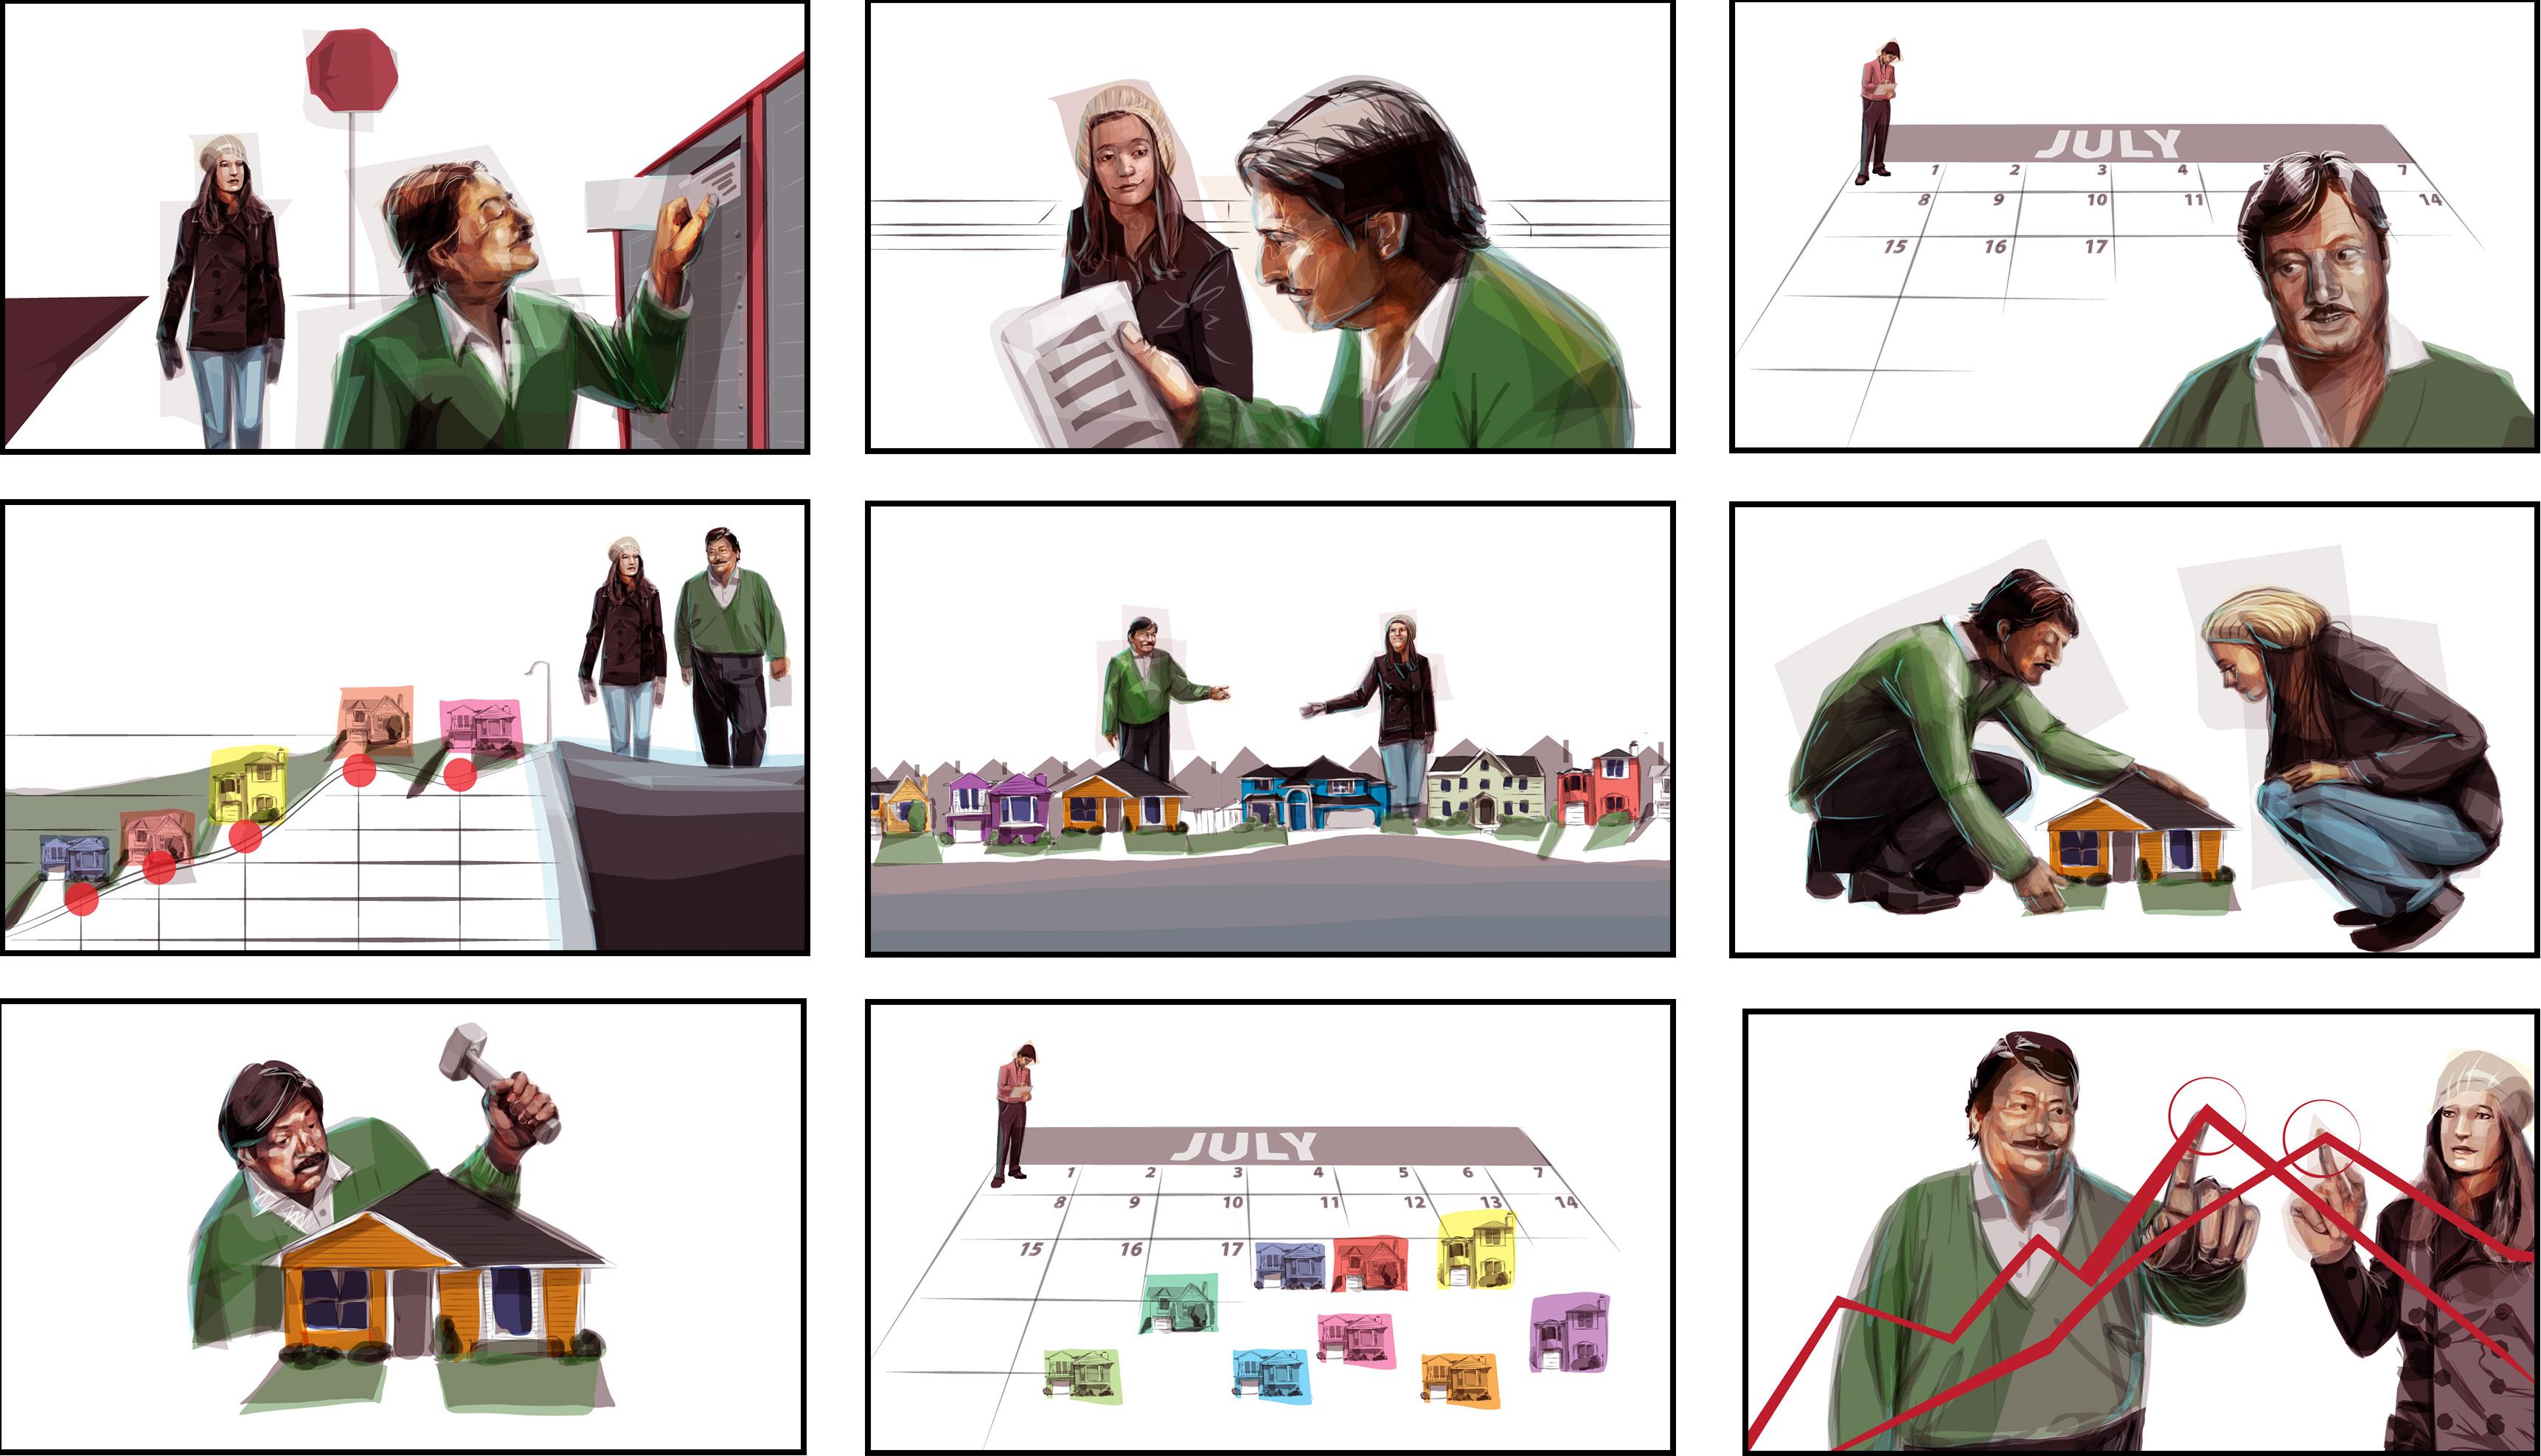 Storyboards Financials Calgary